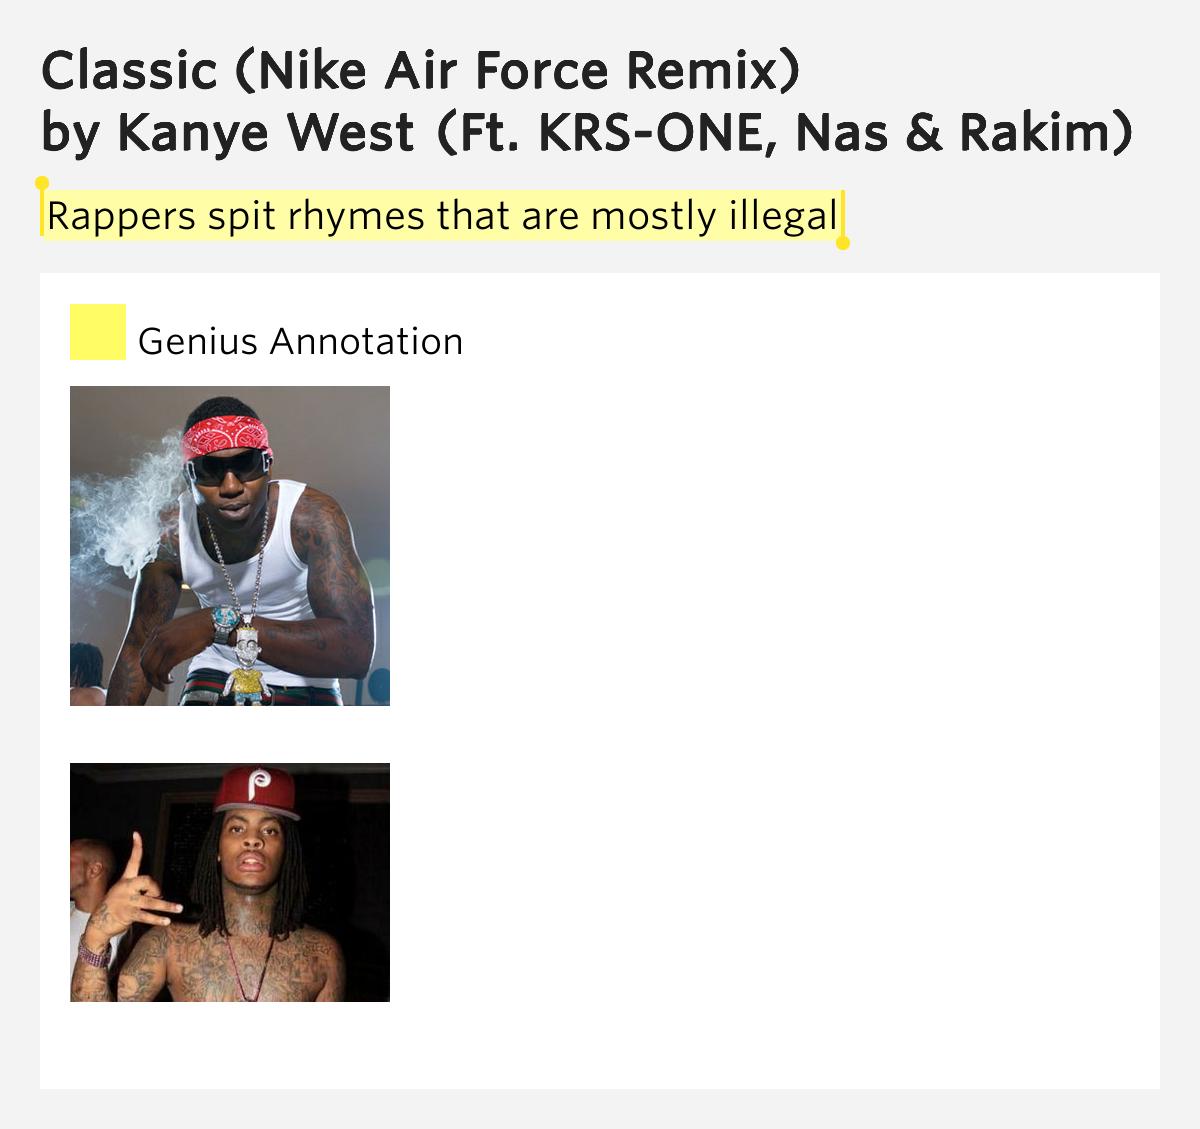 kanye west classic nike air force remix